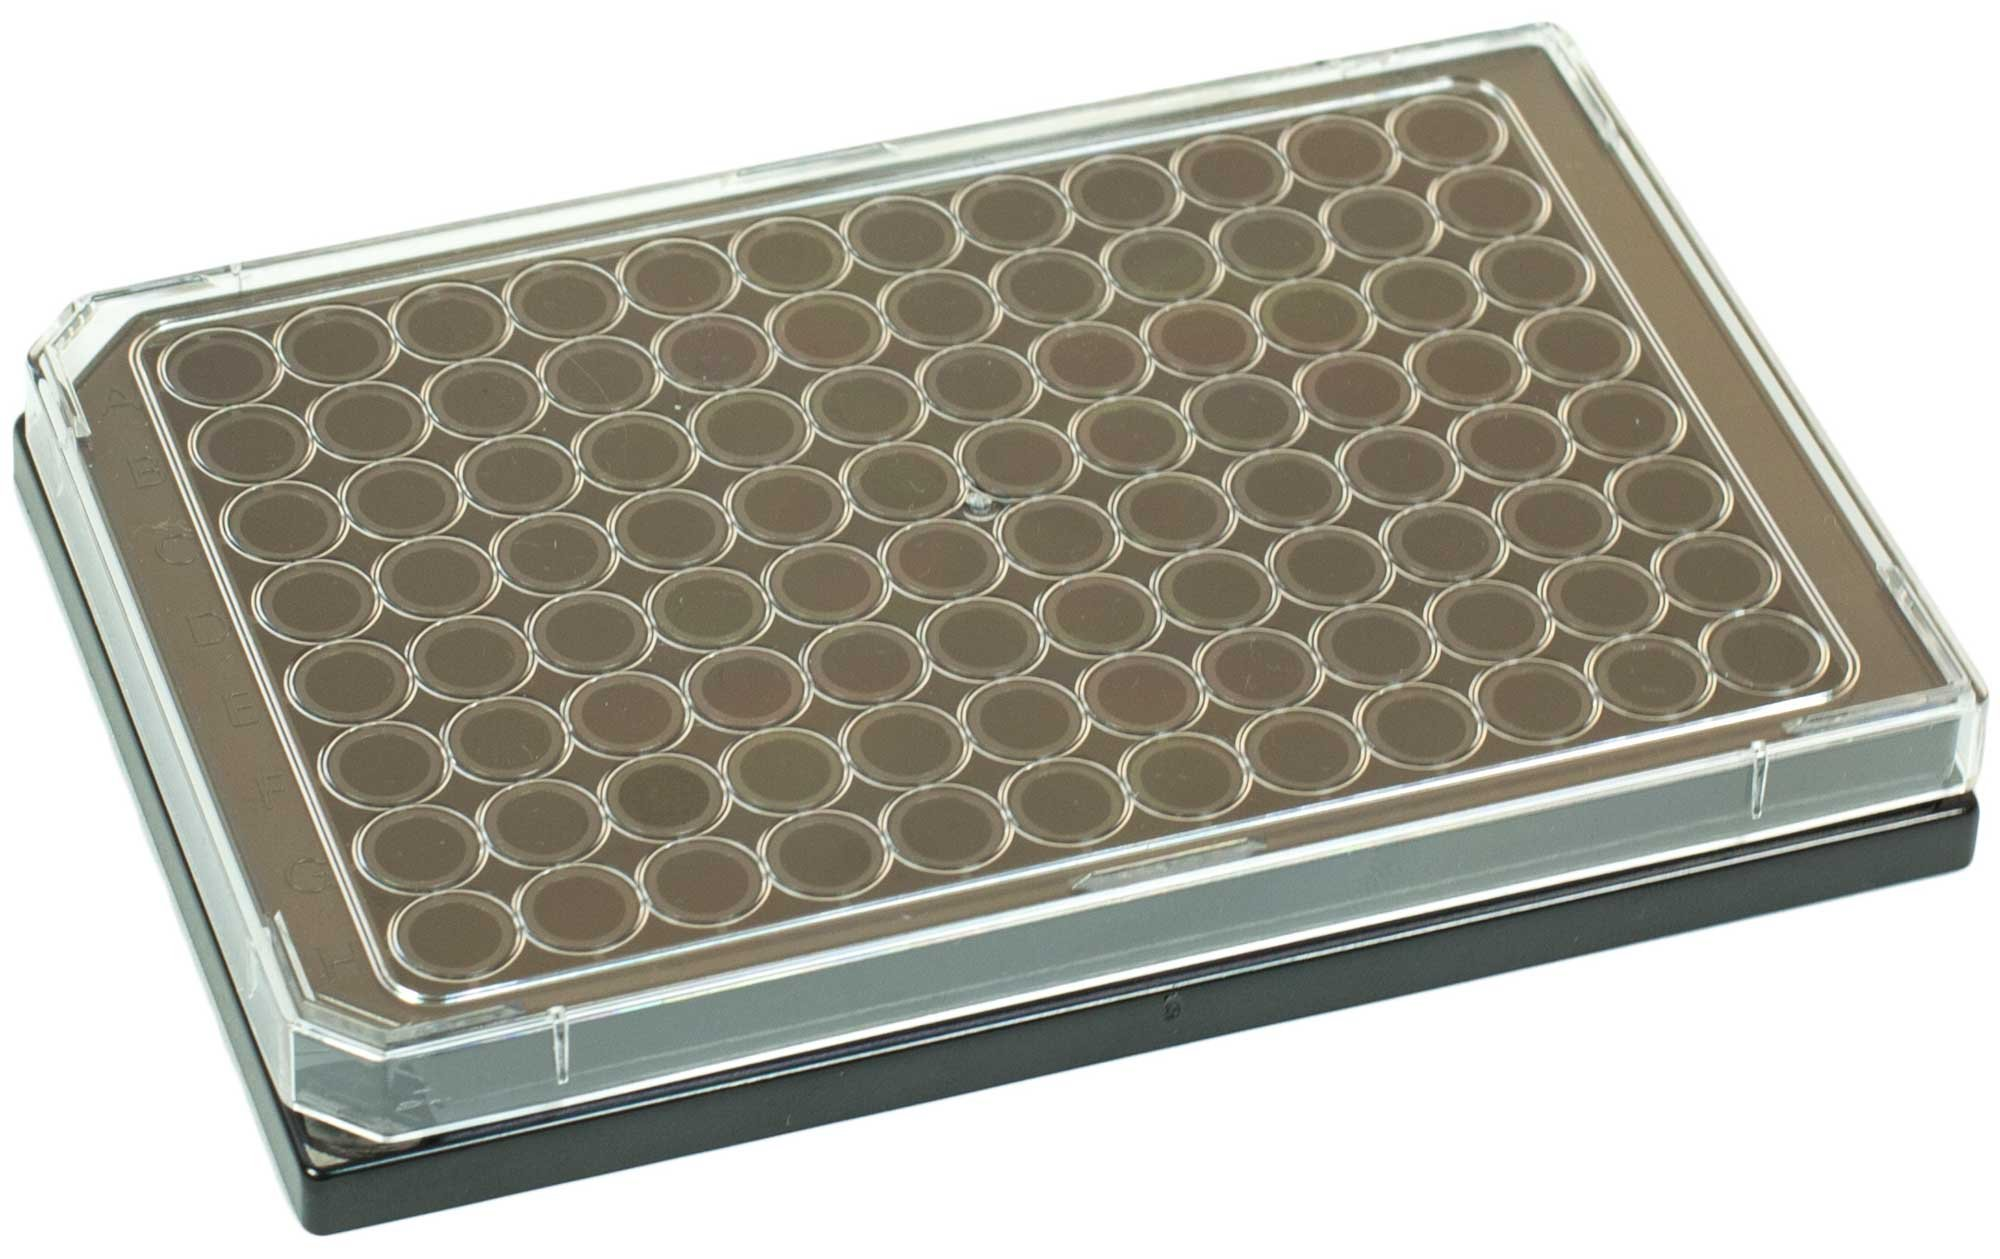 BRANDplates pureGrade S Non-Treated Sterile Surface 96-Well Plate - Black, Transparent F-Bottom